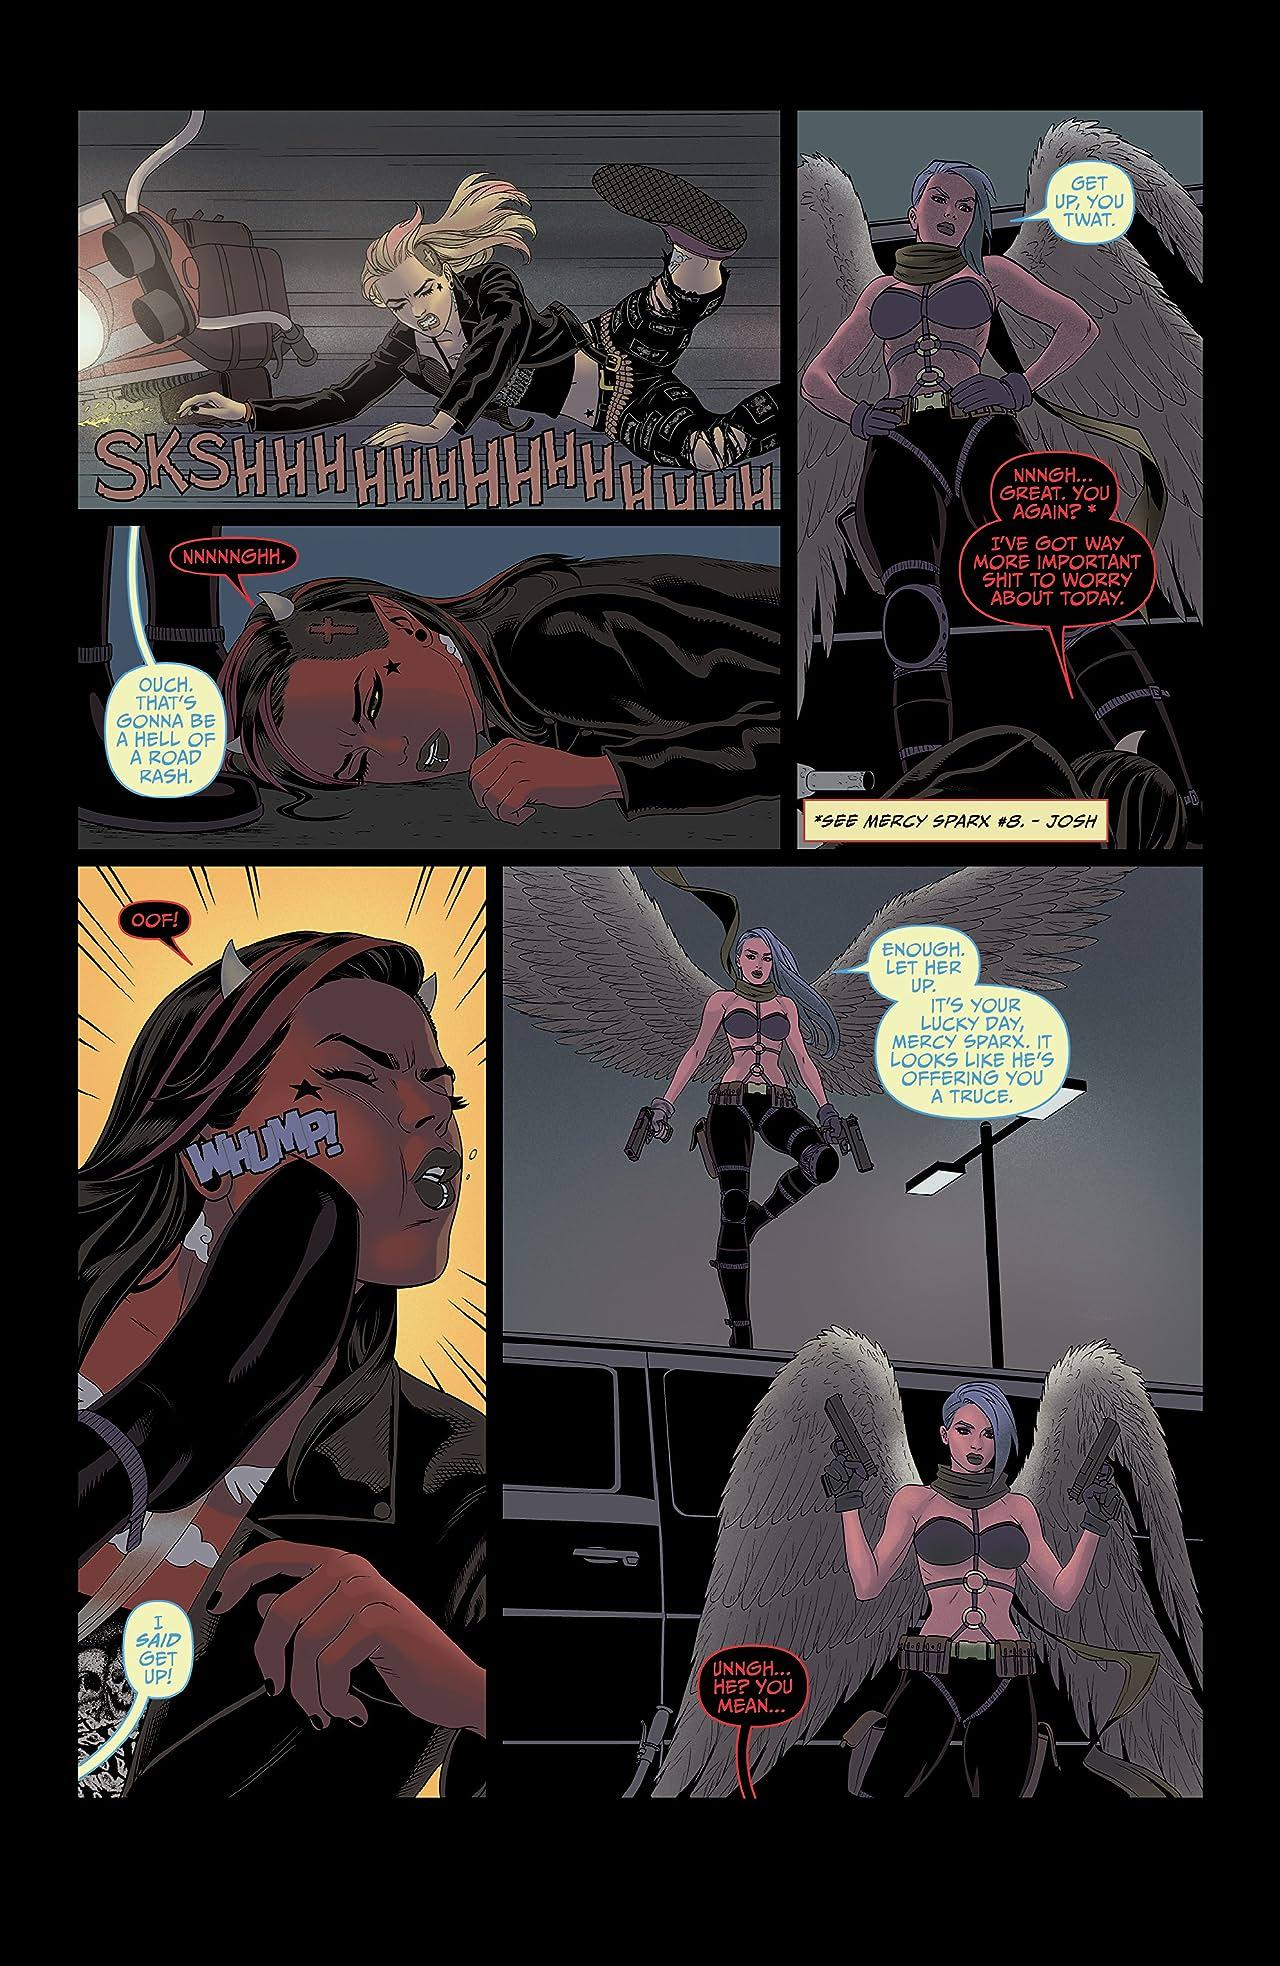 Mercy Sparx Vol.2 #11